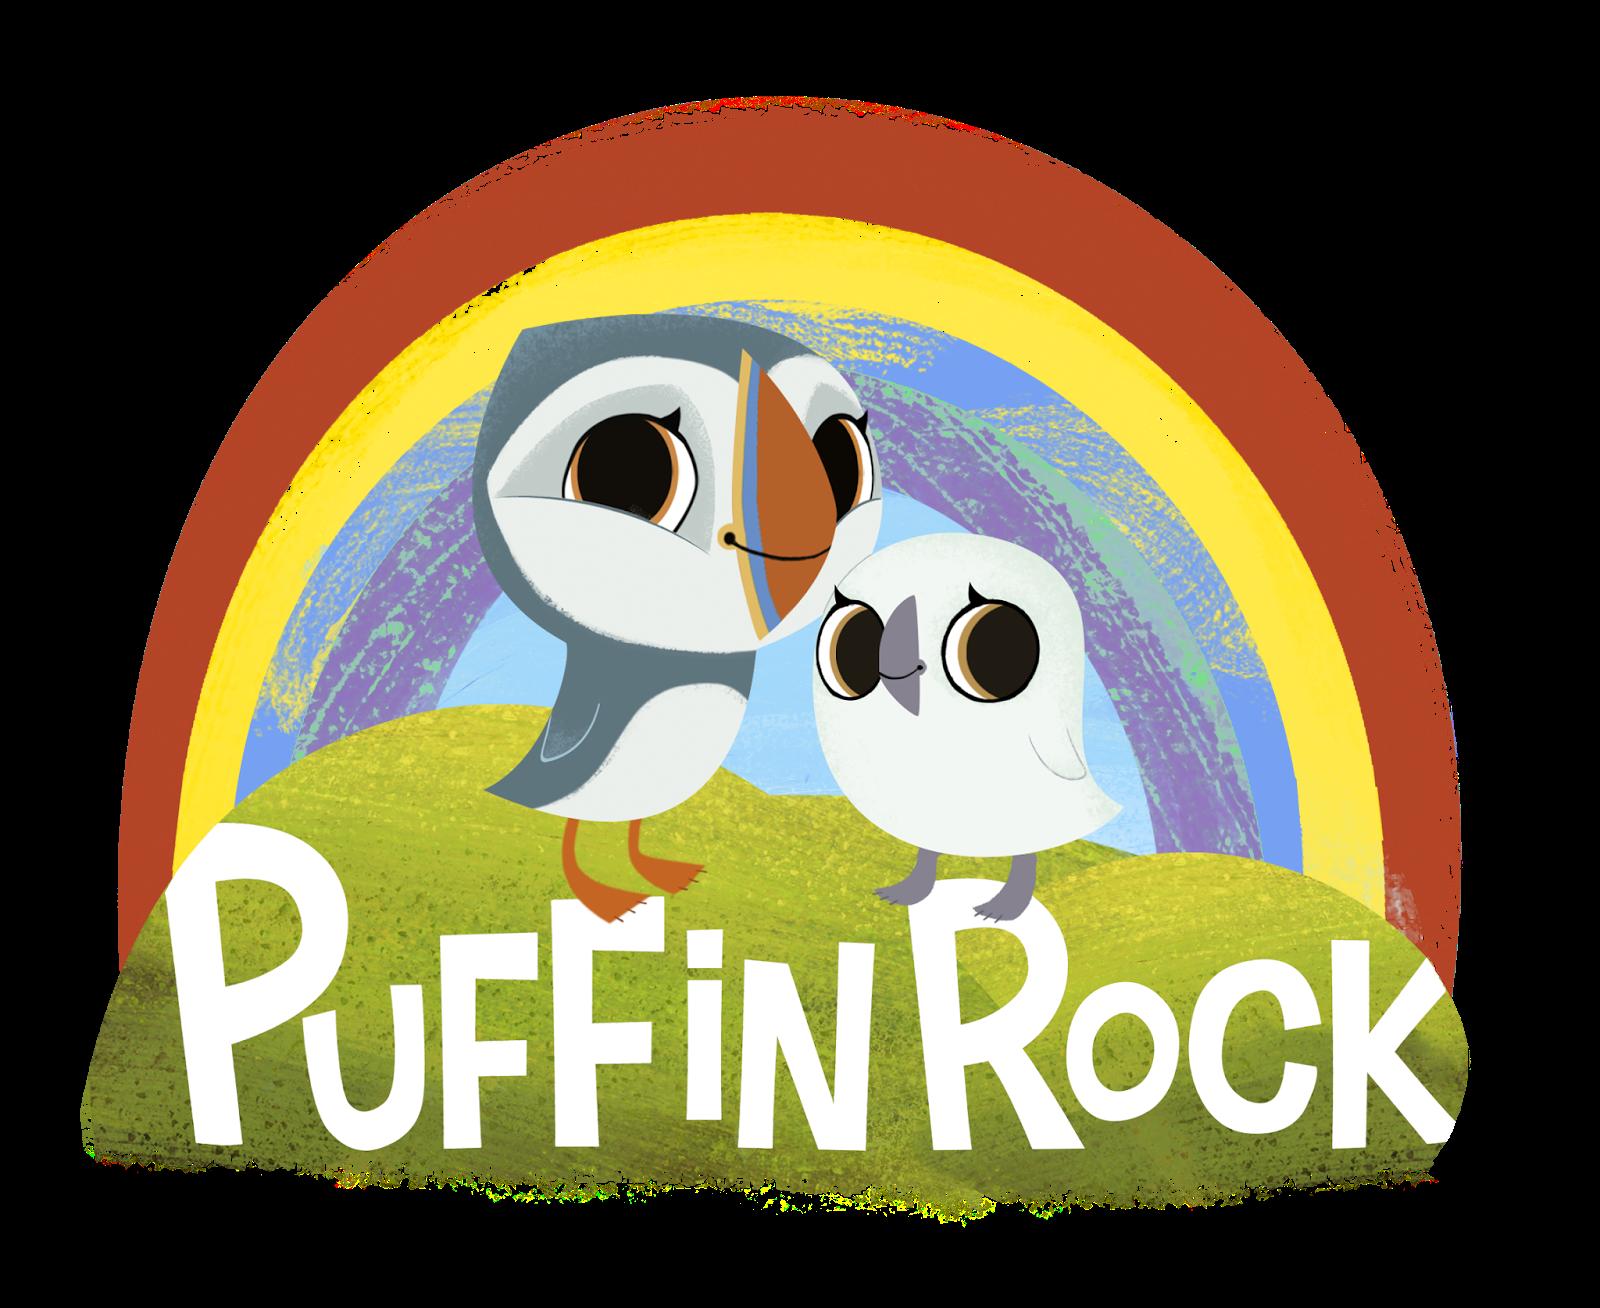 nickalive uk puffin rock flocks to channel 5 s milkshake